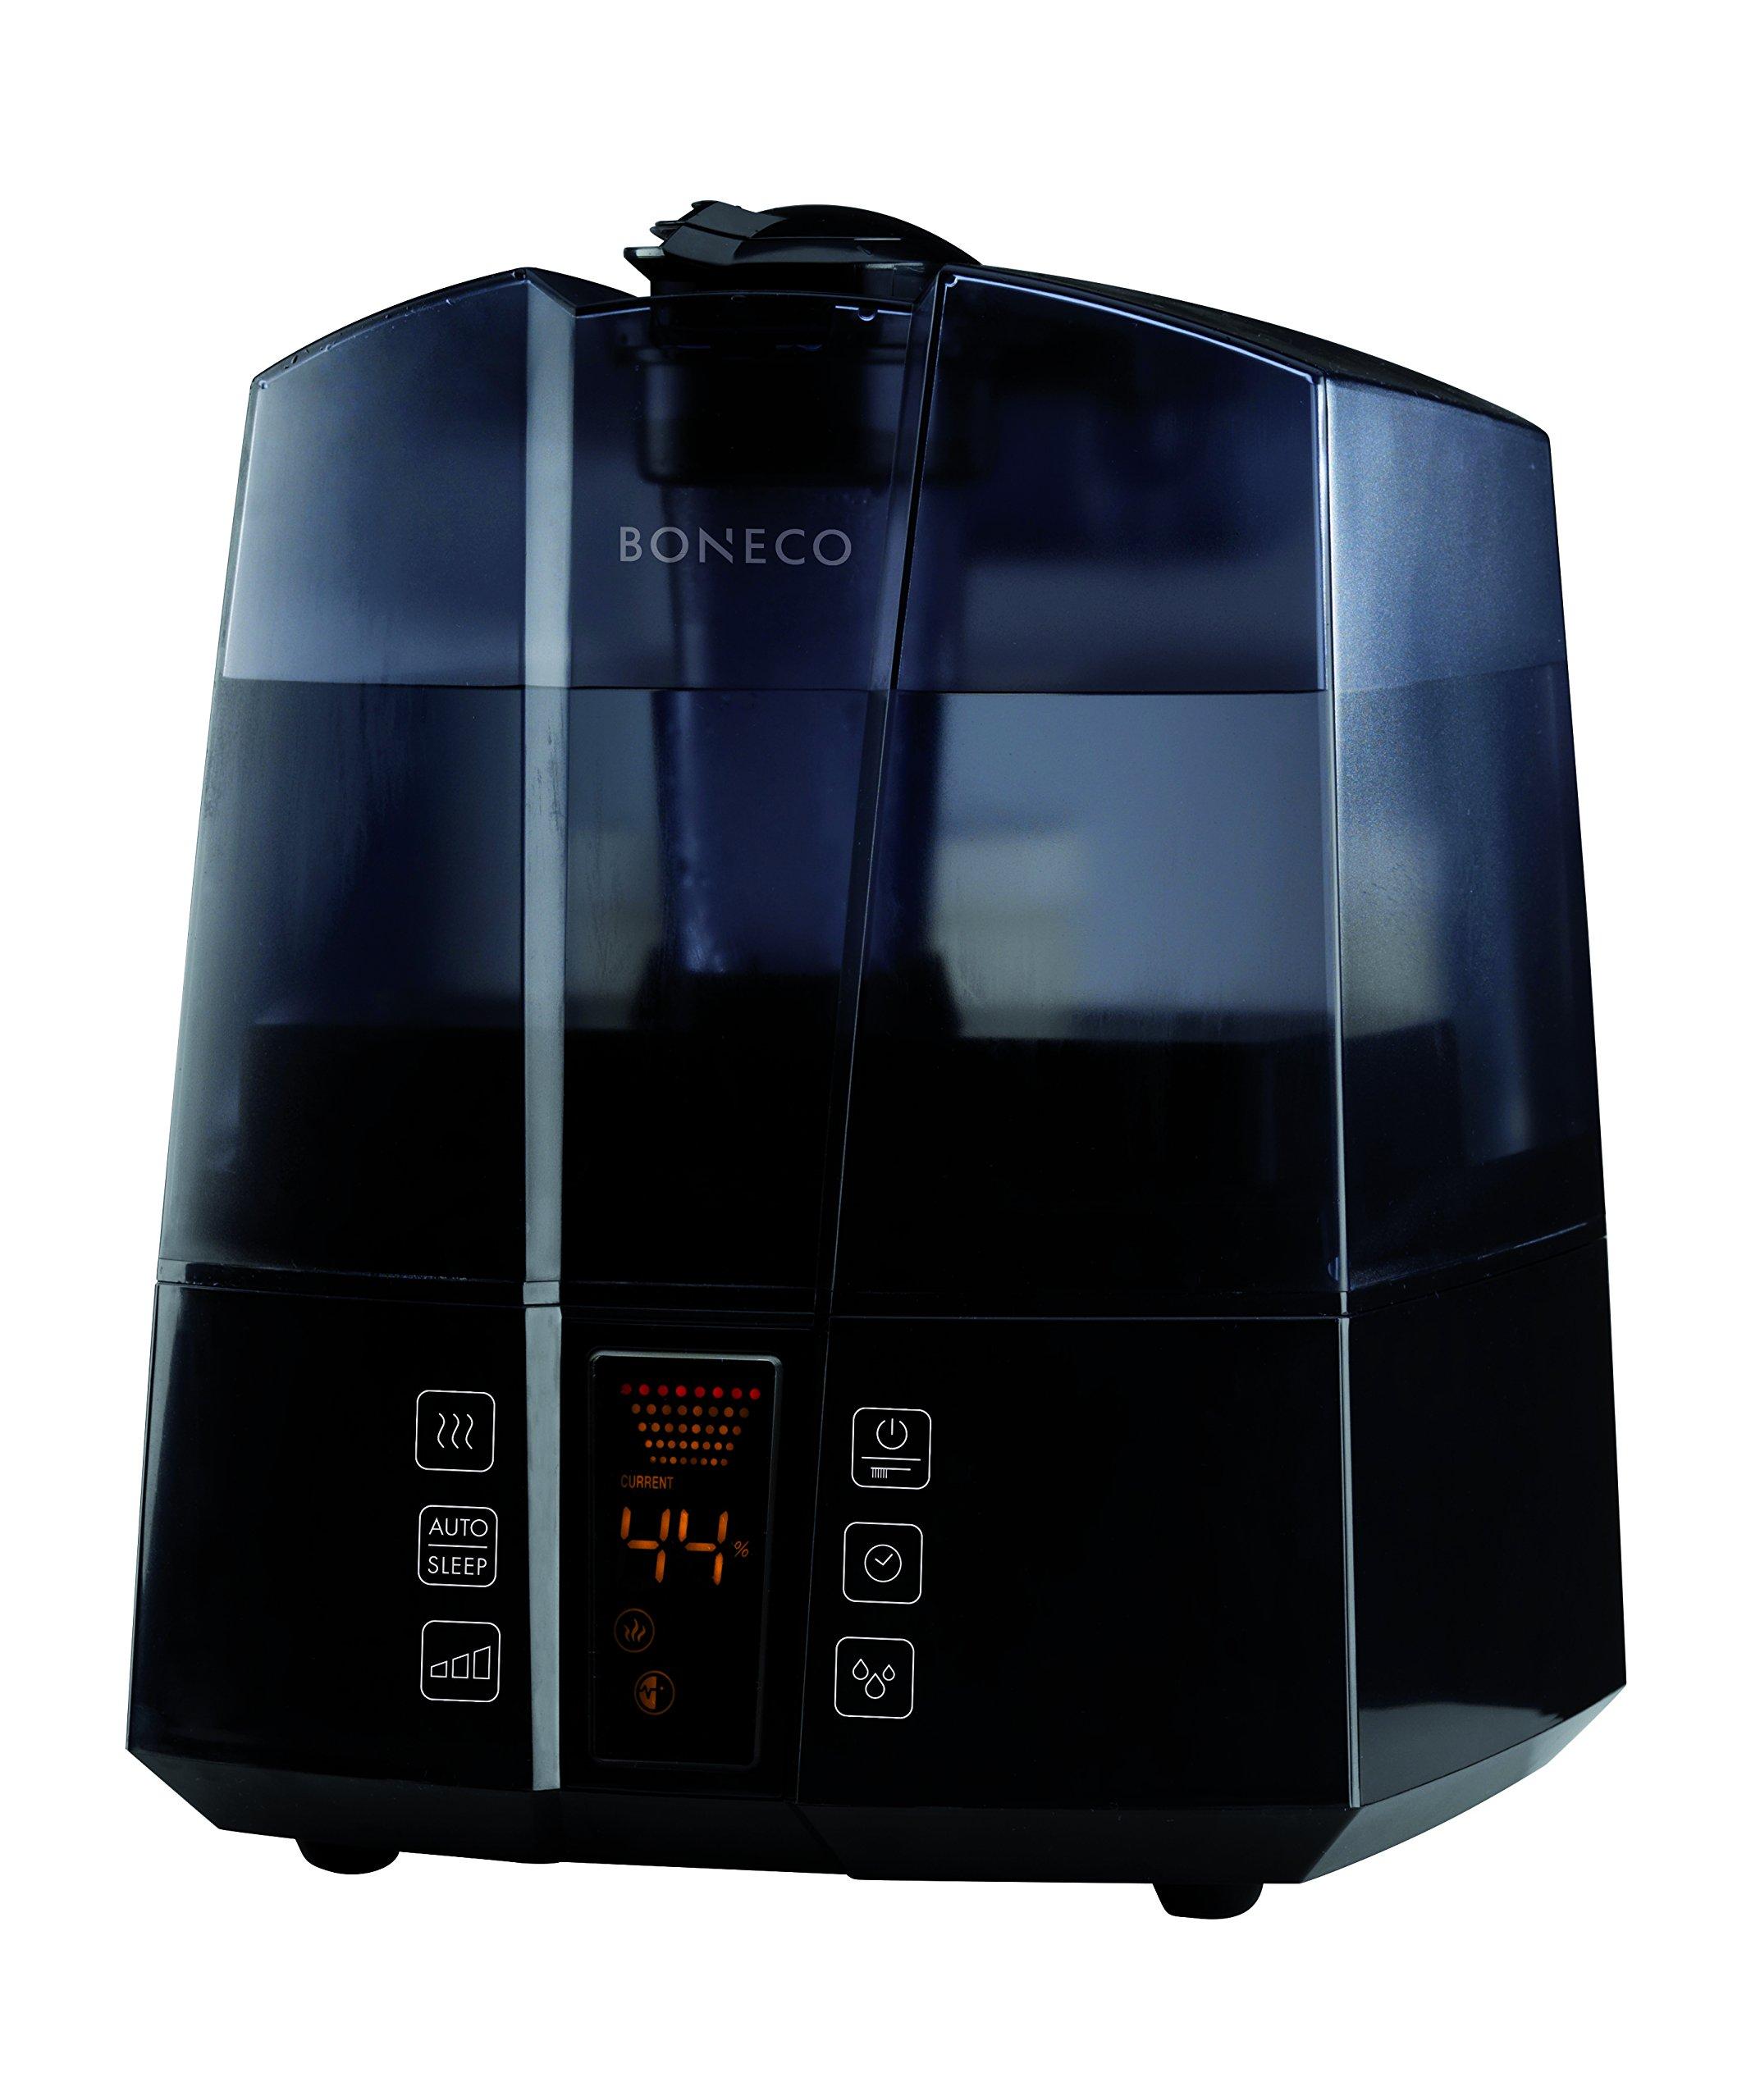 BONECO/Air-O-Swiss Warm or Cool Mist Ultrasonic Humidifier 7147